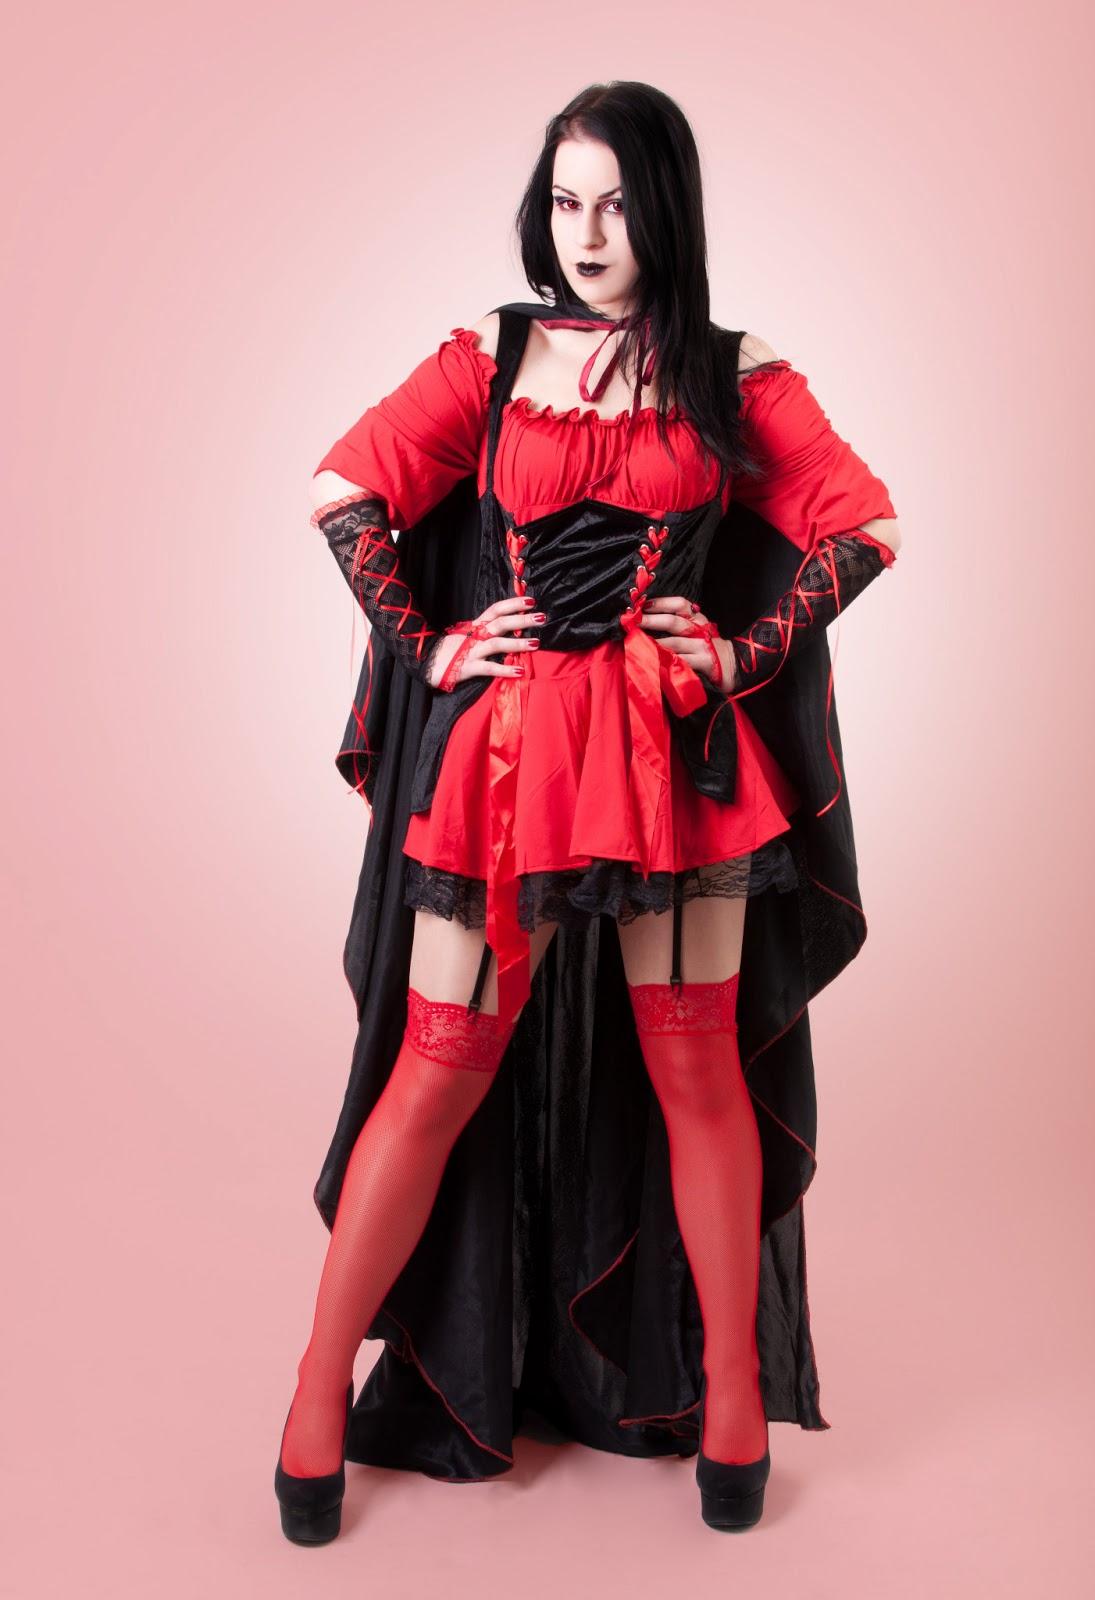 Aevoulette Benssalconia Red Riding Hood